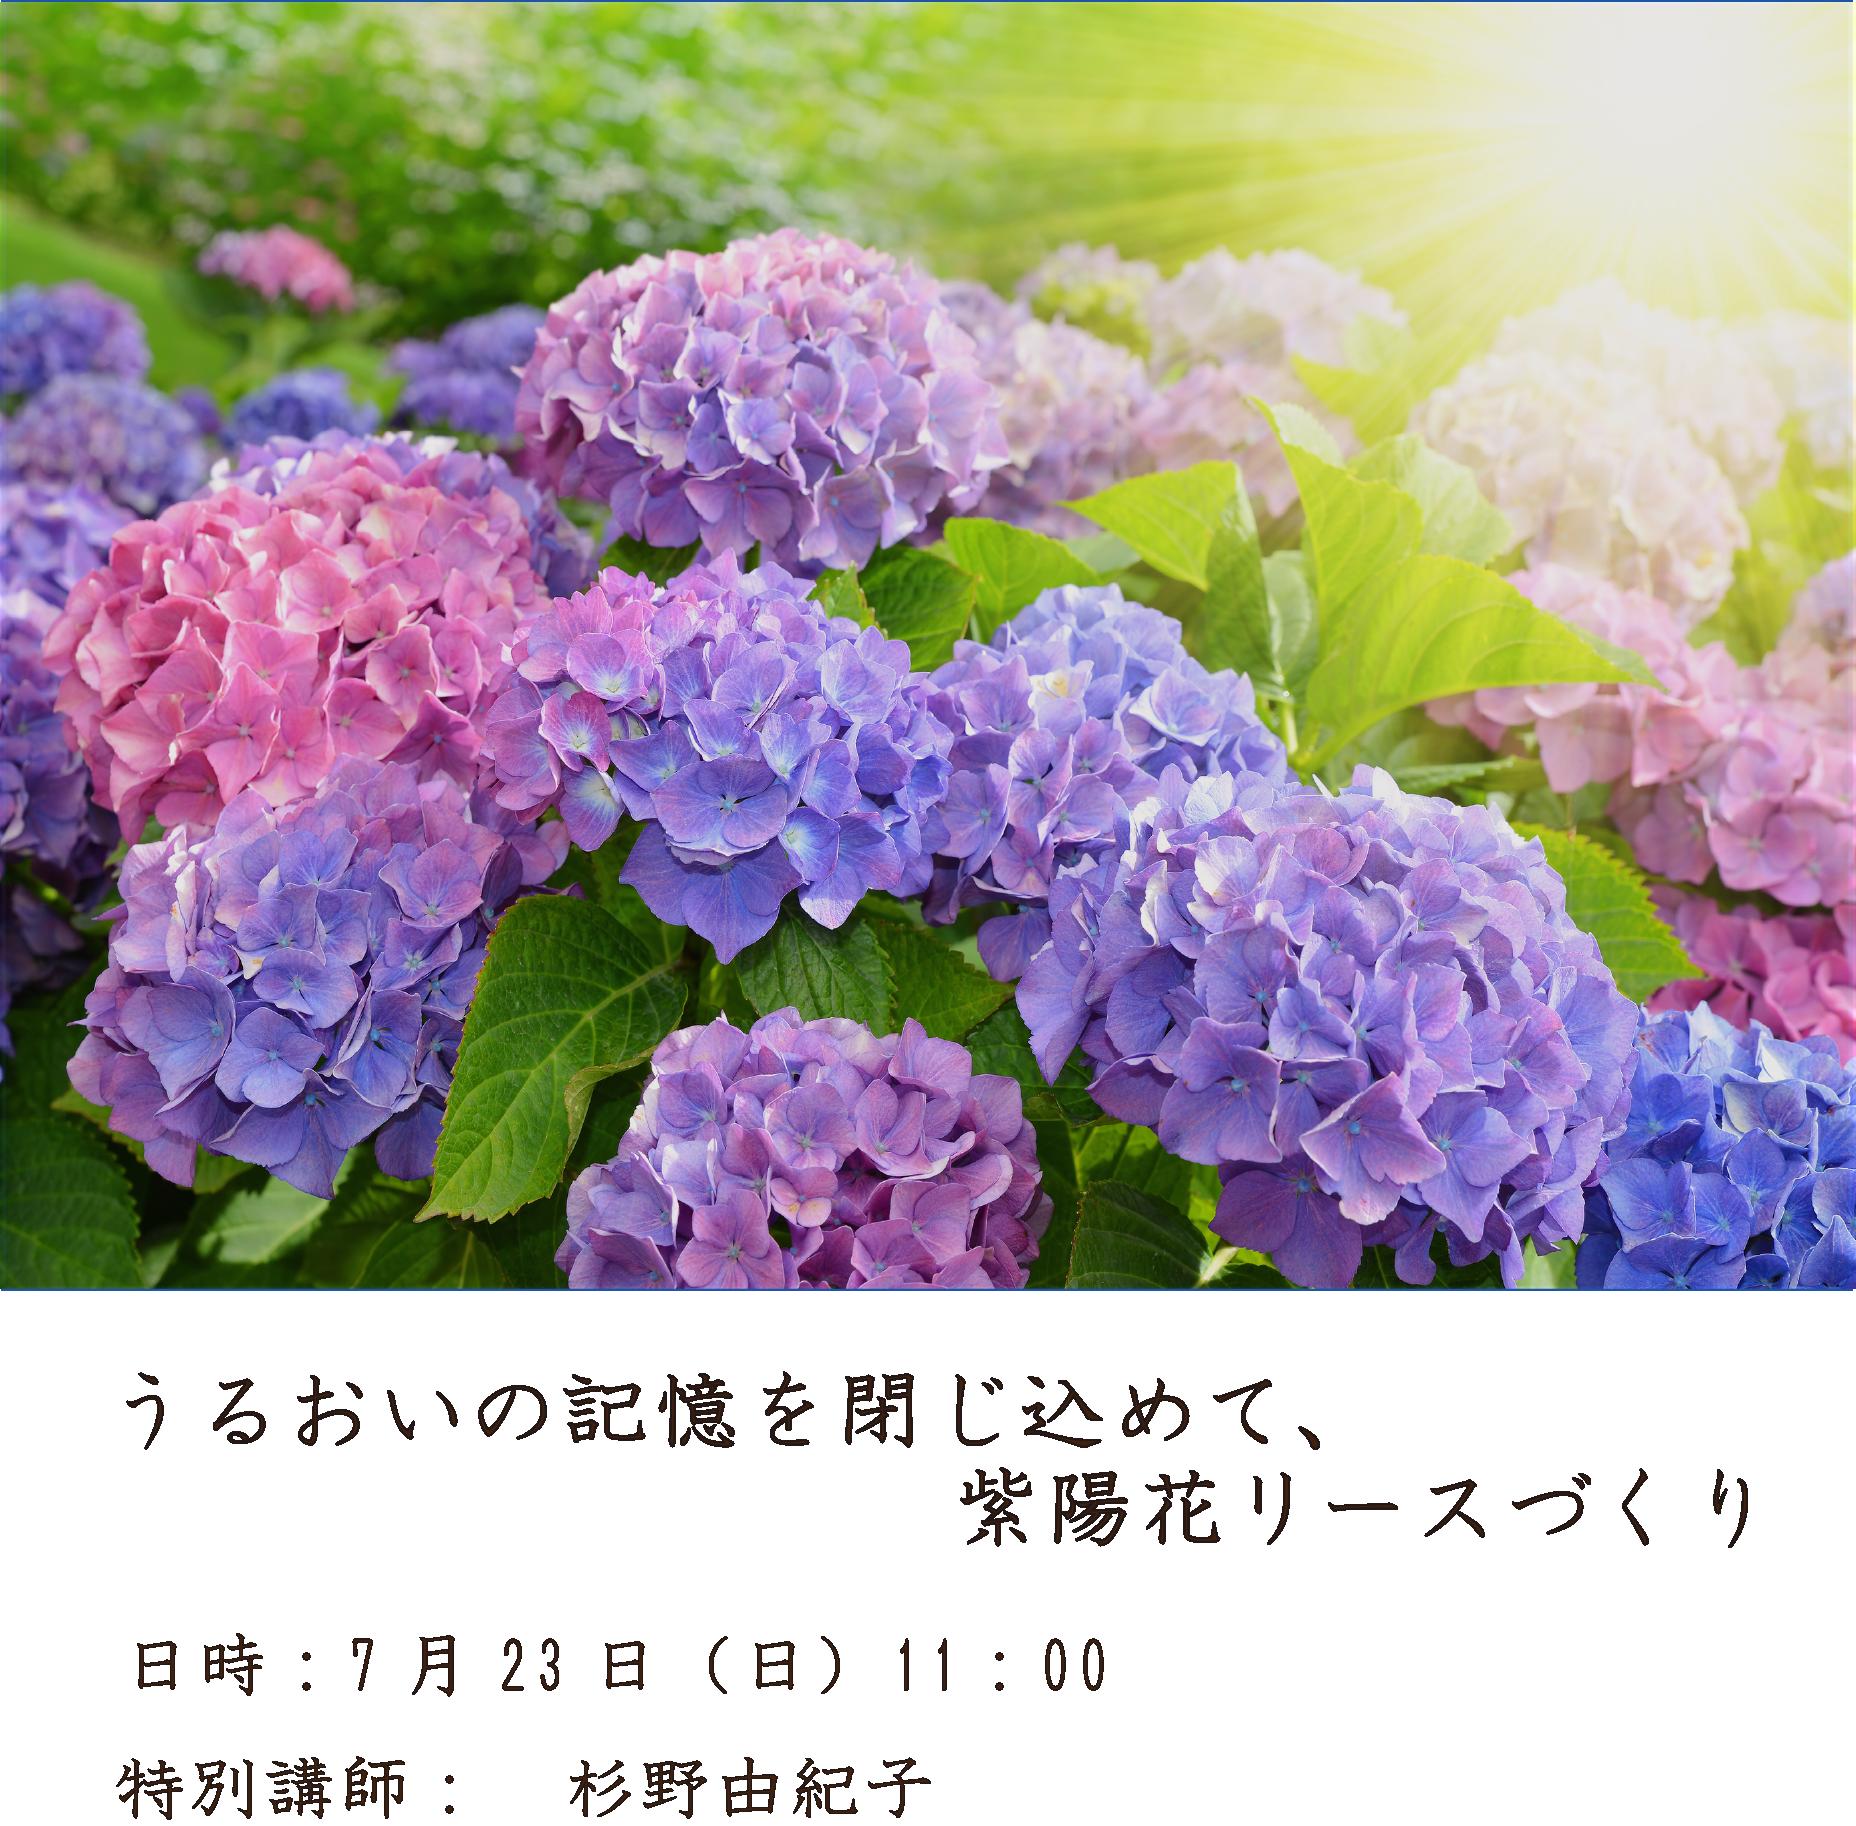 d94ee2_b5f45b494b85408cbea1a0d1860193a6-mv2_d_2800_1869_s_2